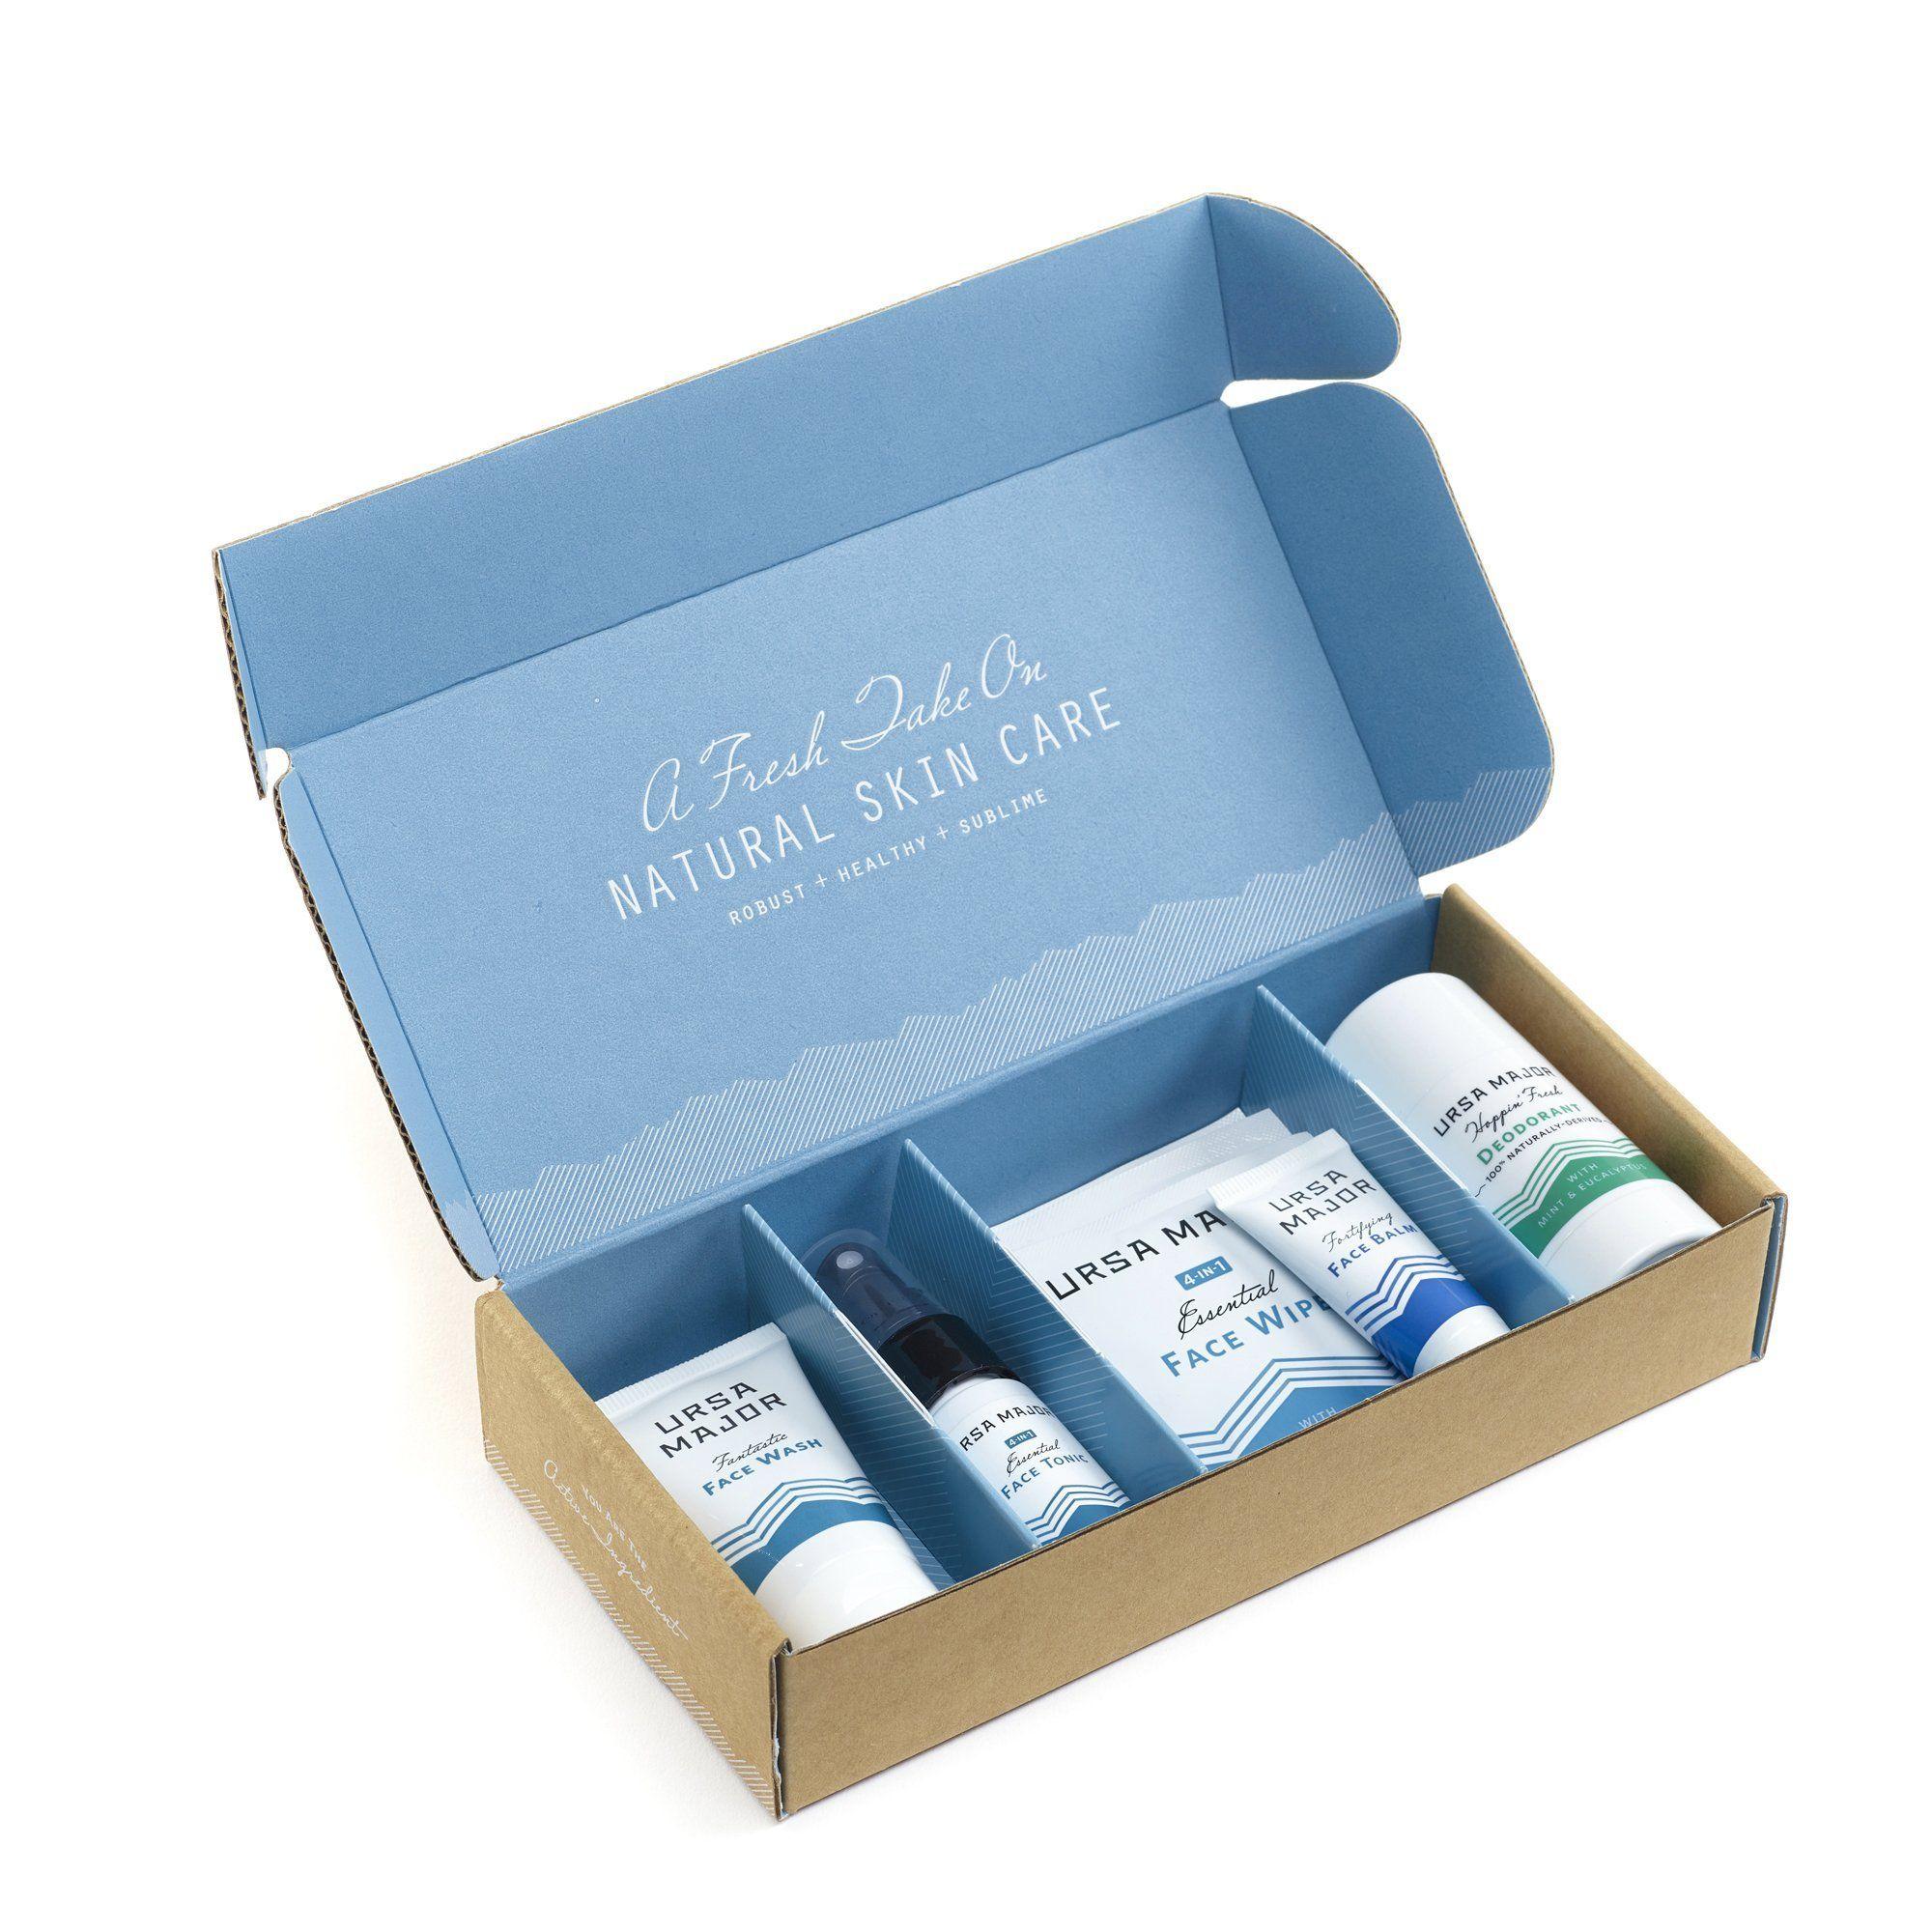 Bestsellers trial kit in 2020 natural skin natural skin